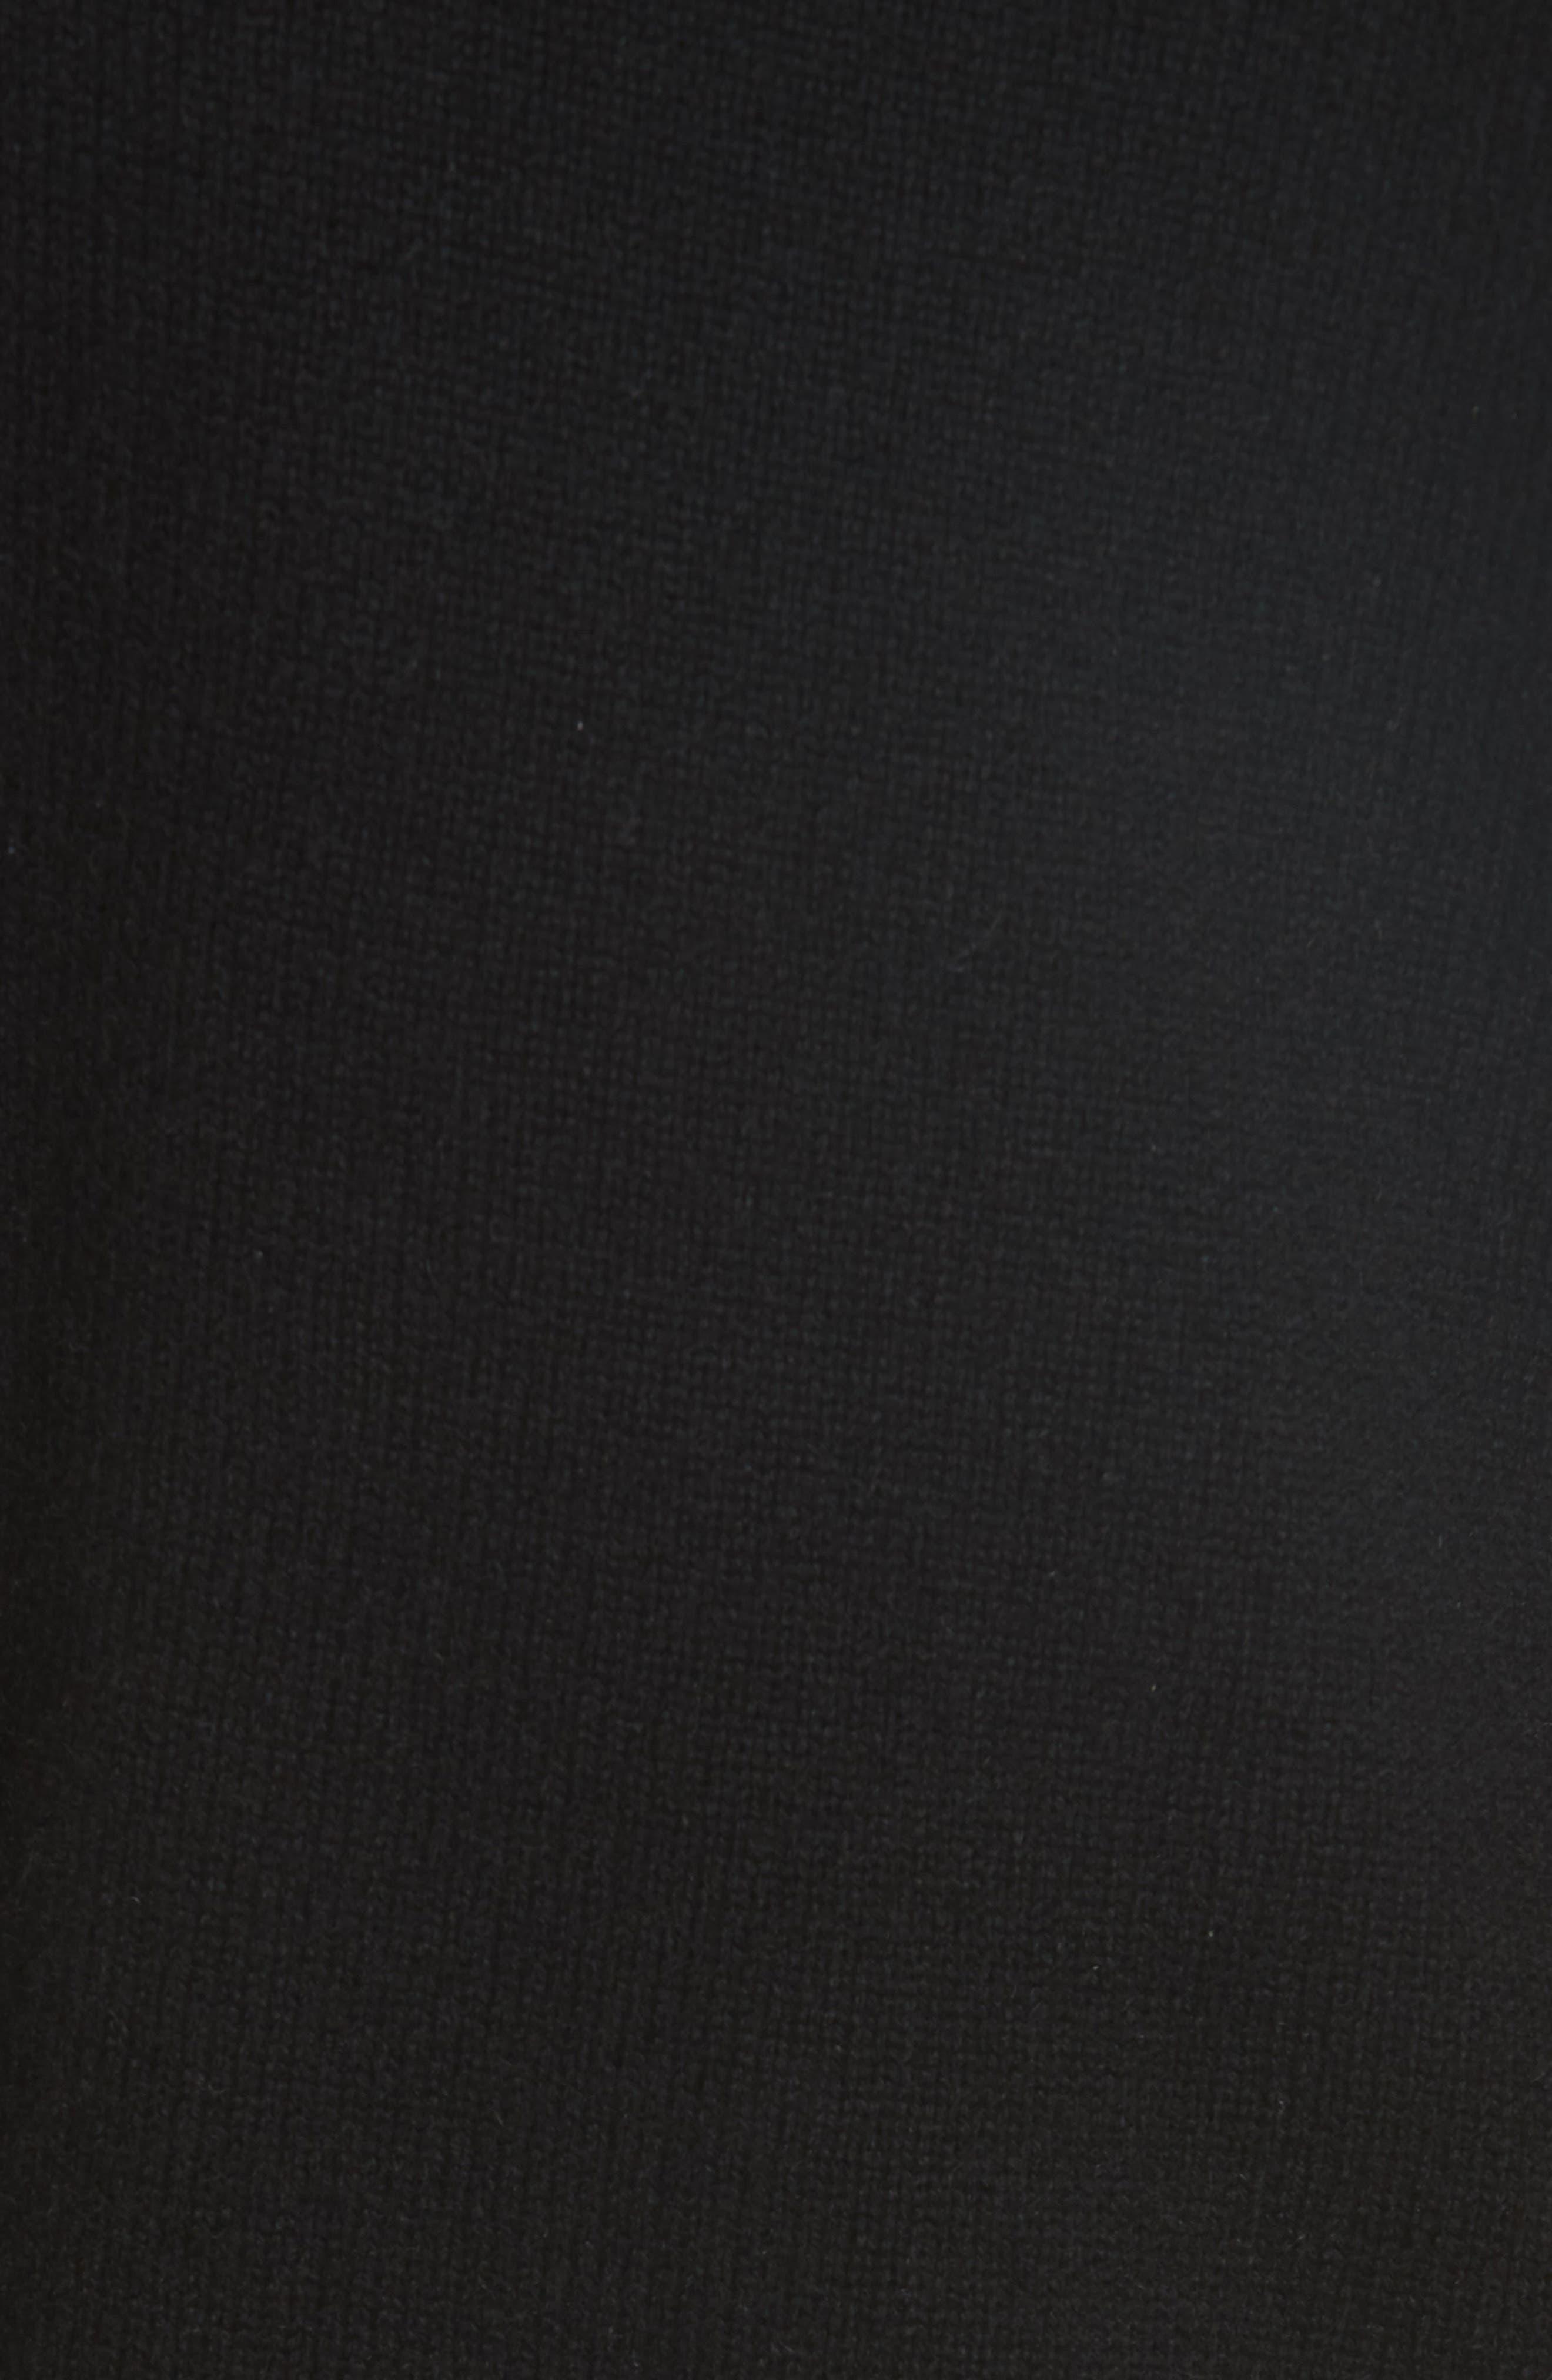 One Shoulder Slit Pullover Sweater,                             Alternate thumbnail 5, color,                             001